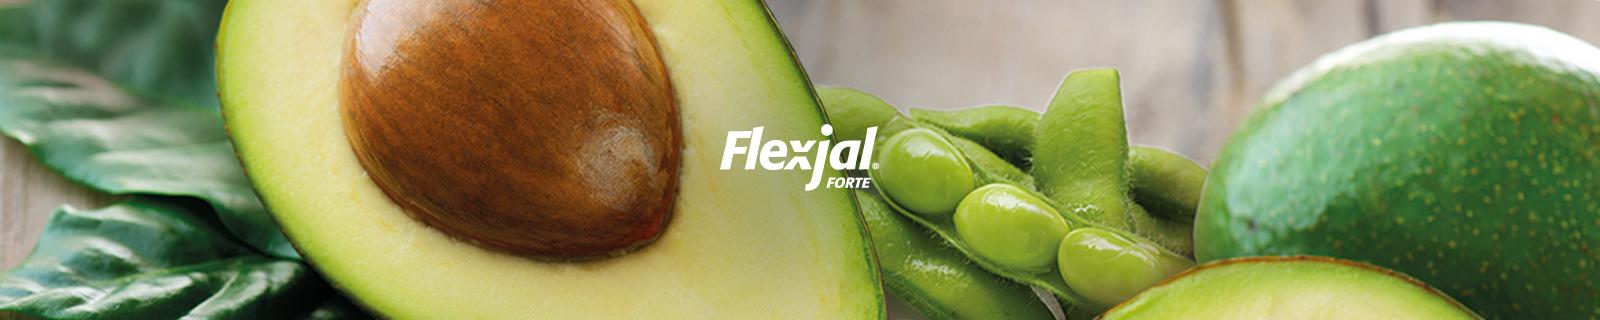 Flex-jal Forte Integratore